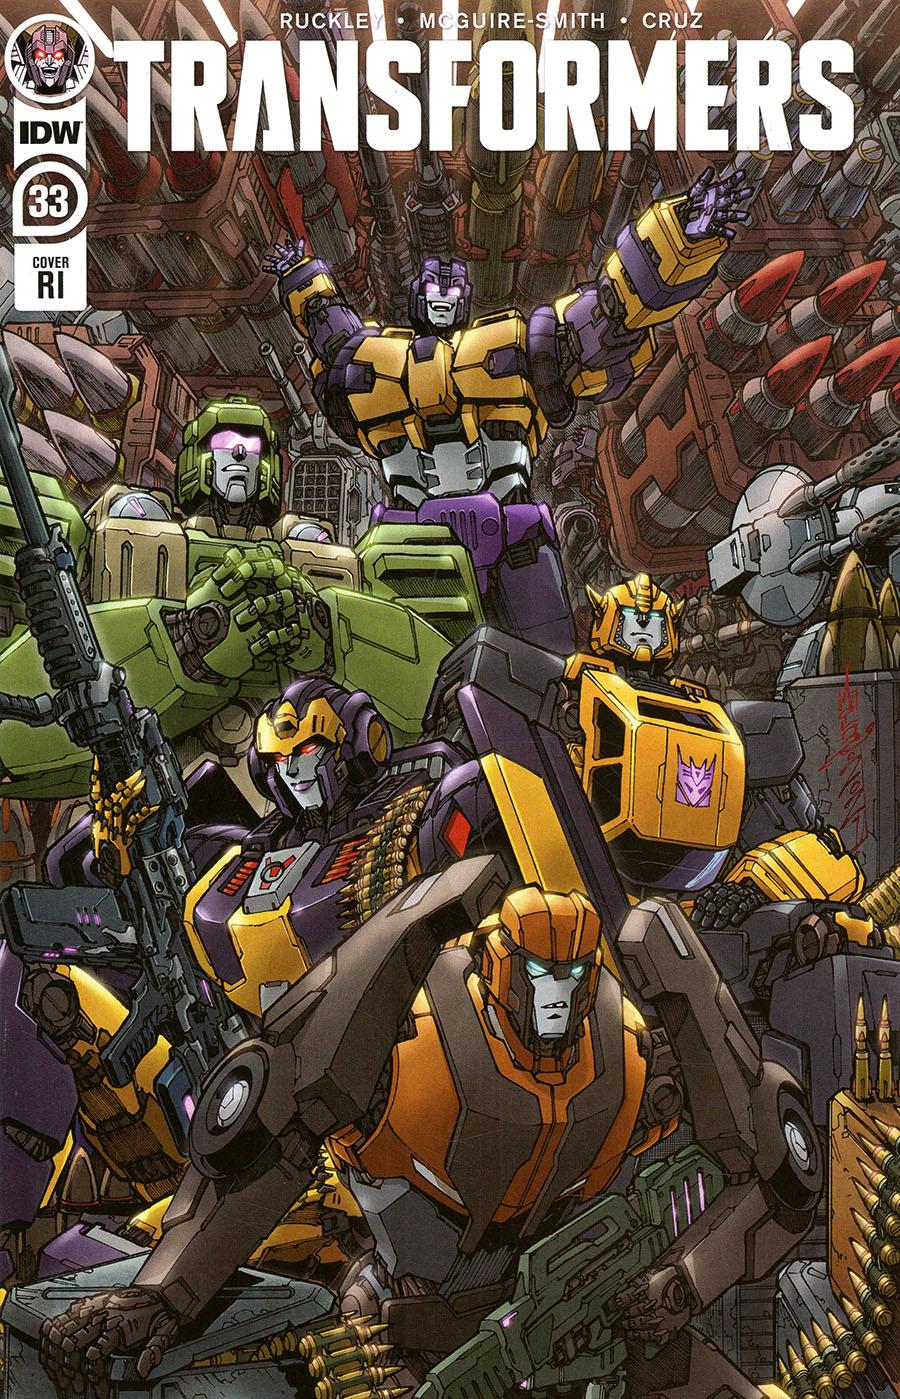 Transformers Vol 4 #33 Cover C Incentive Alex Milne Variant Cover